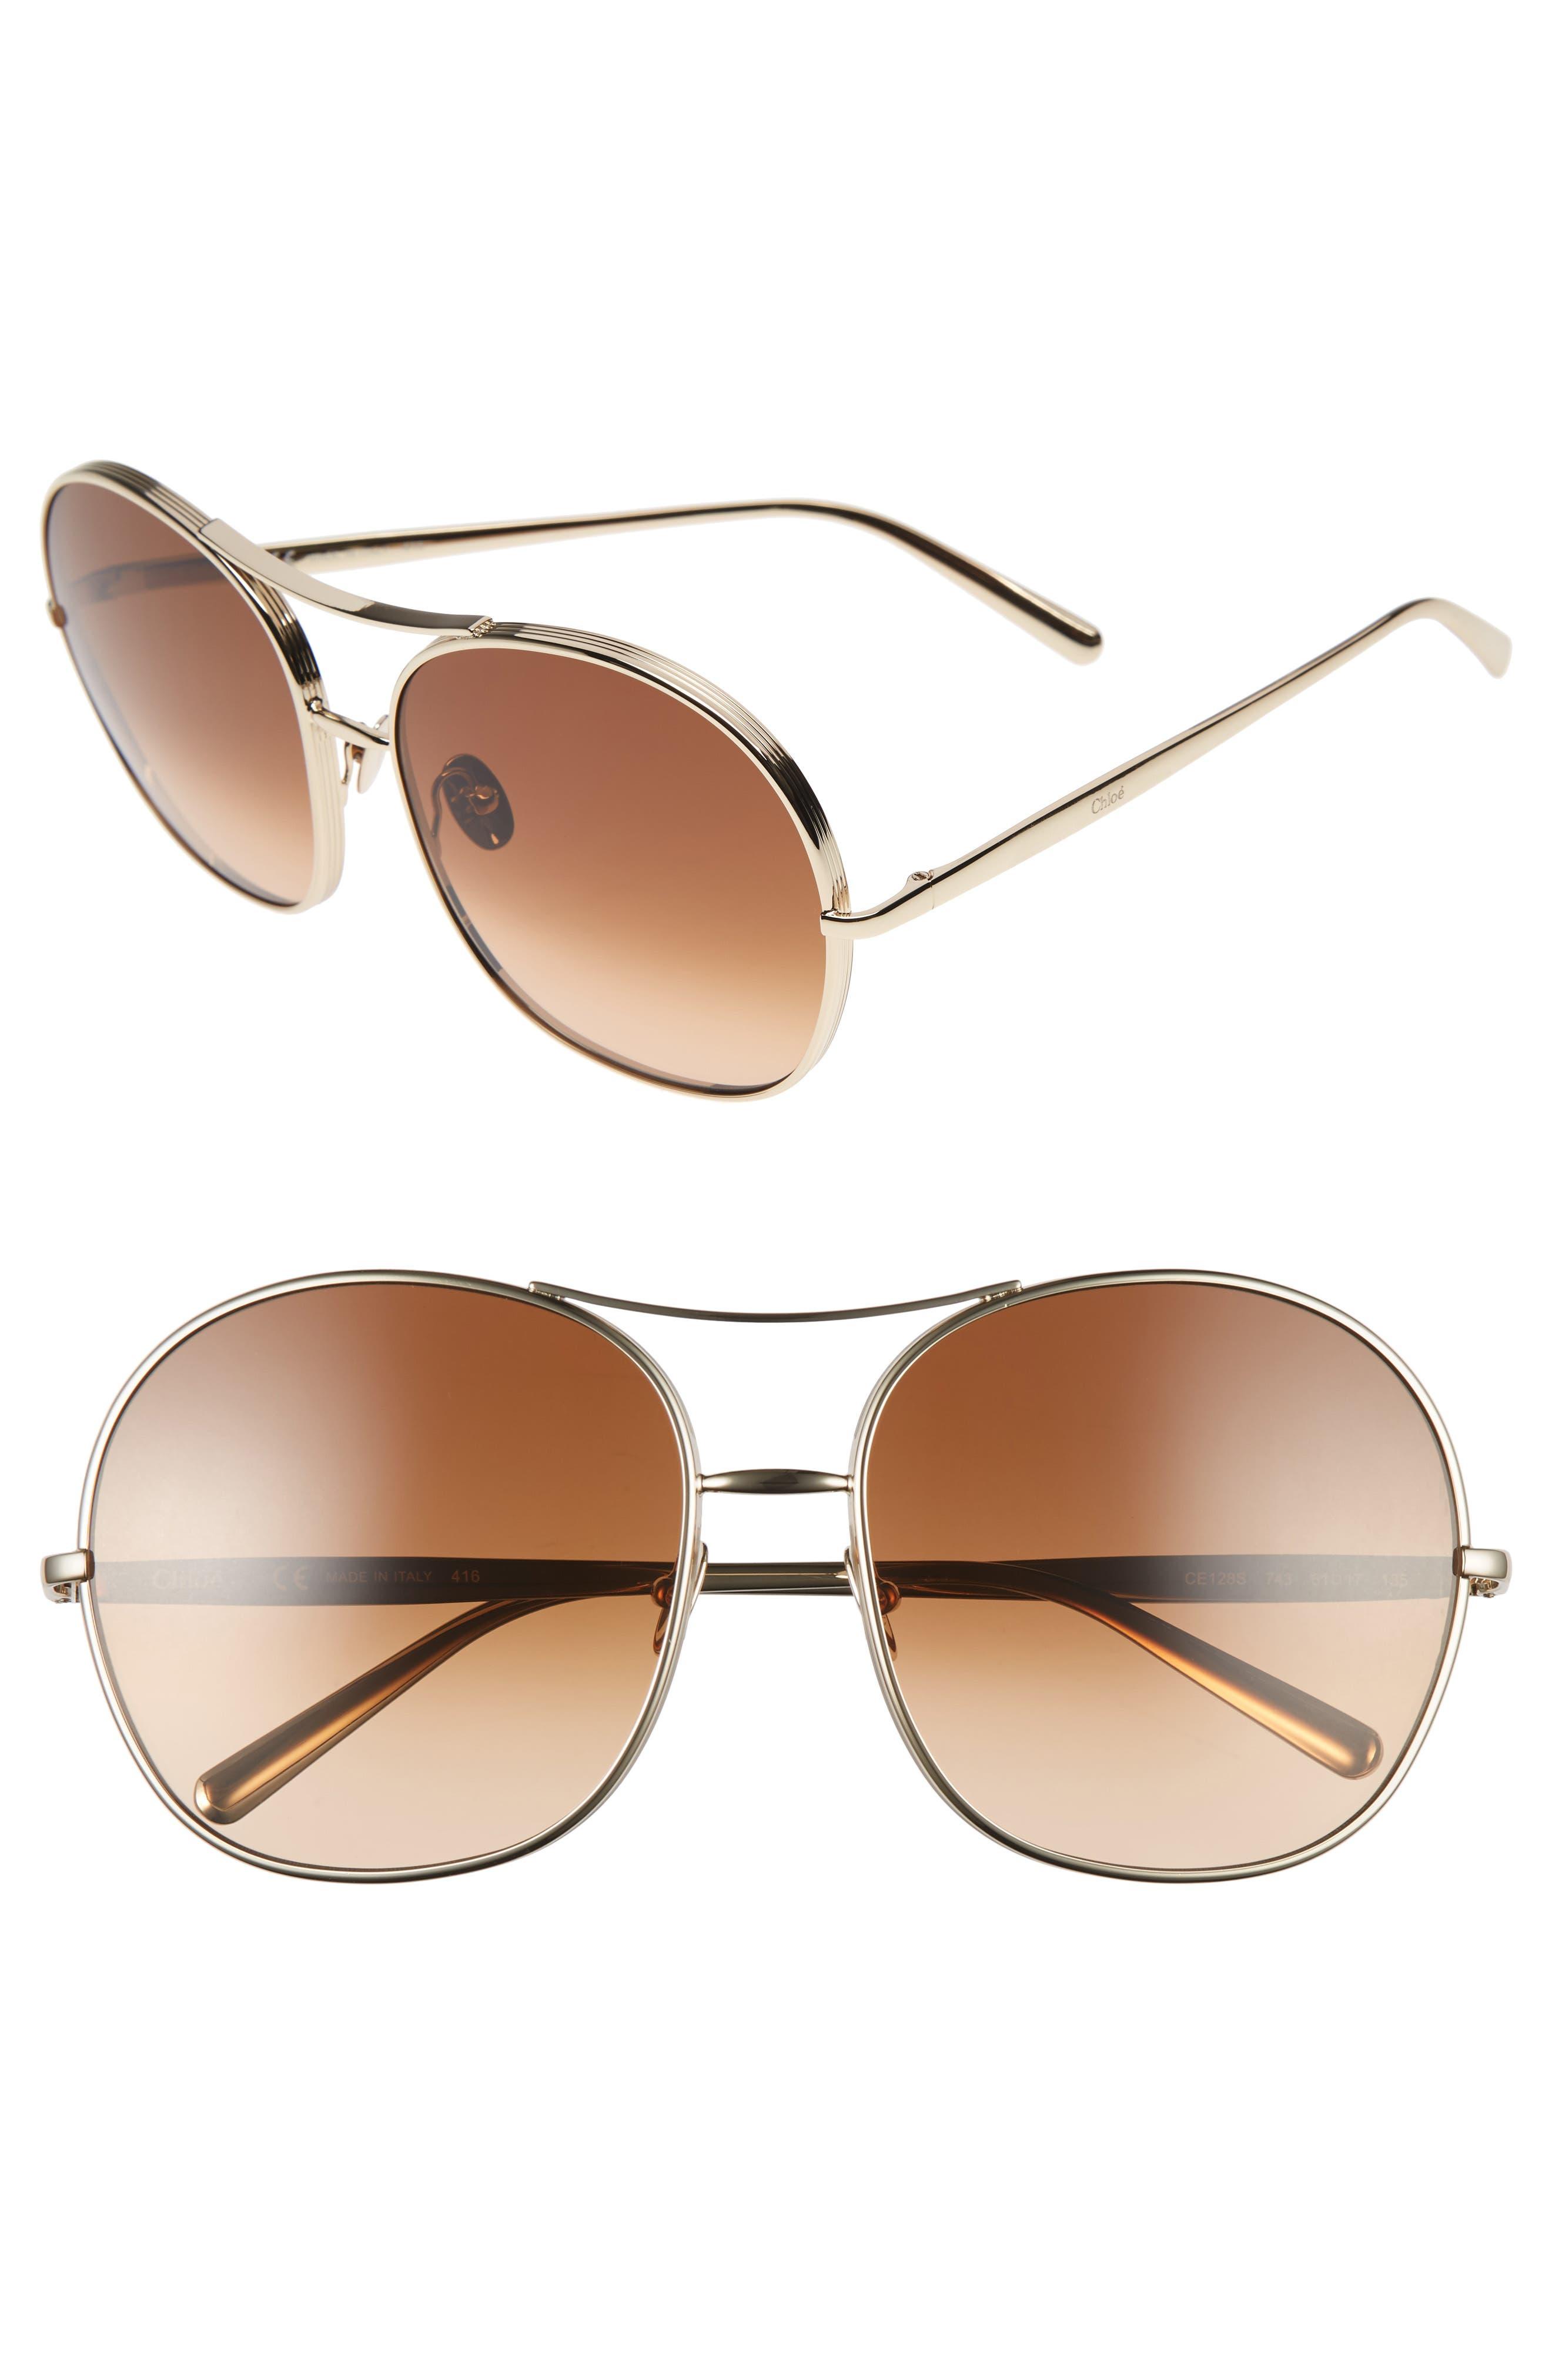 61mm Oversize Aviator Sunglasses,                         Main,                         color, 710